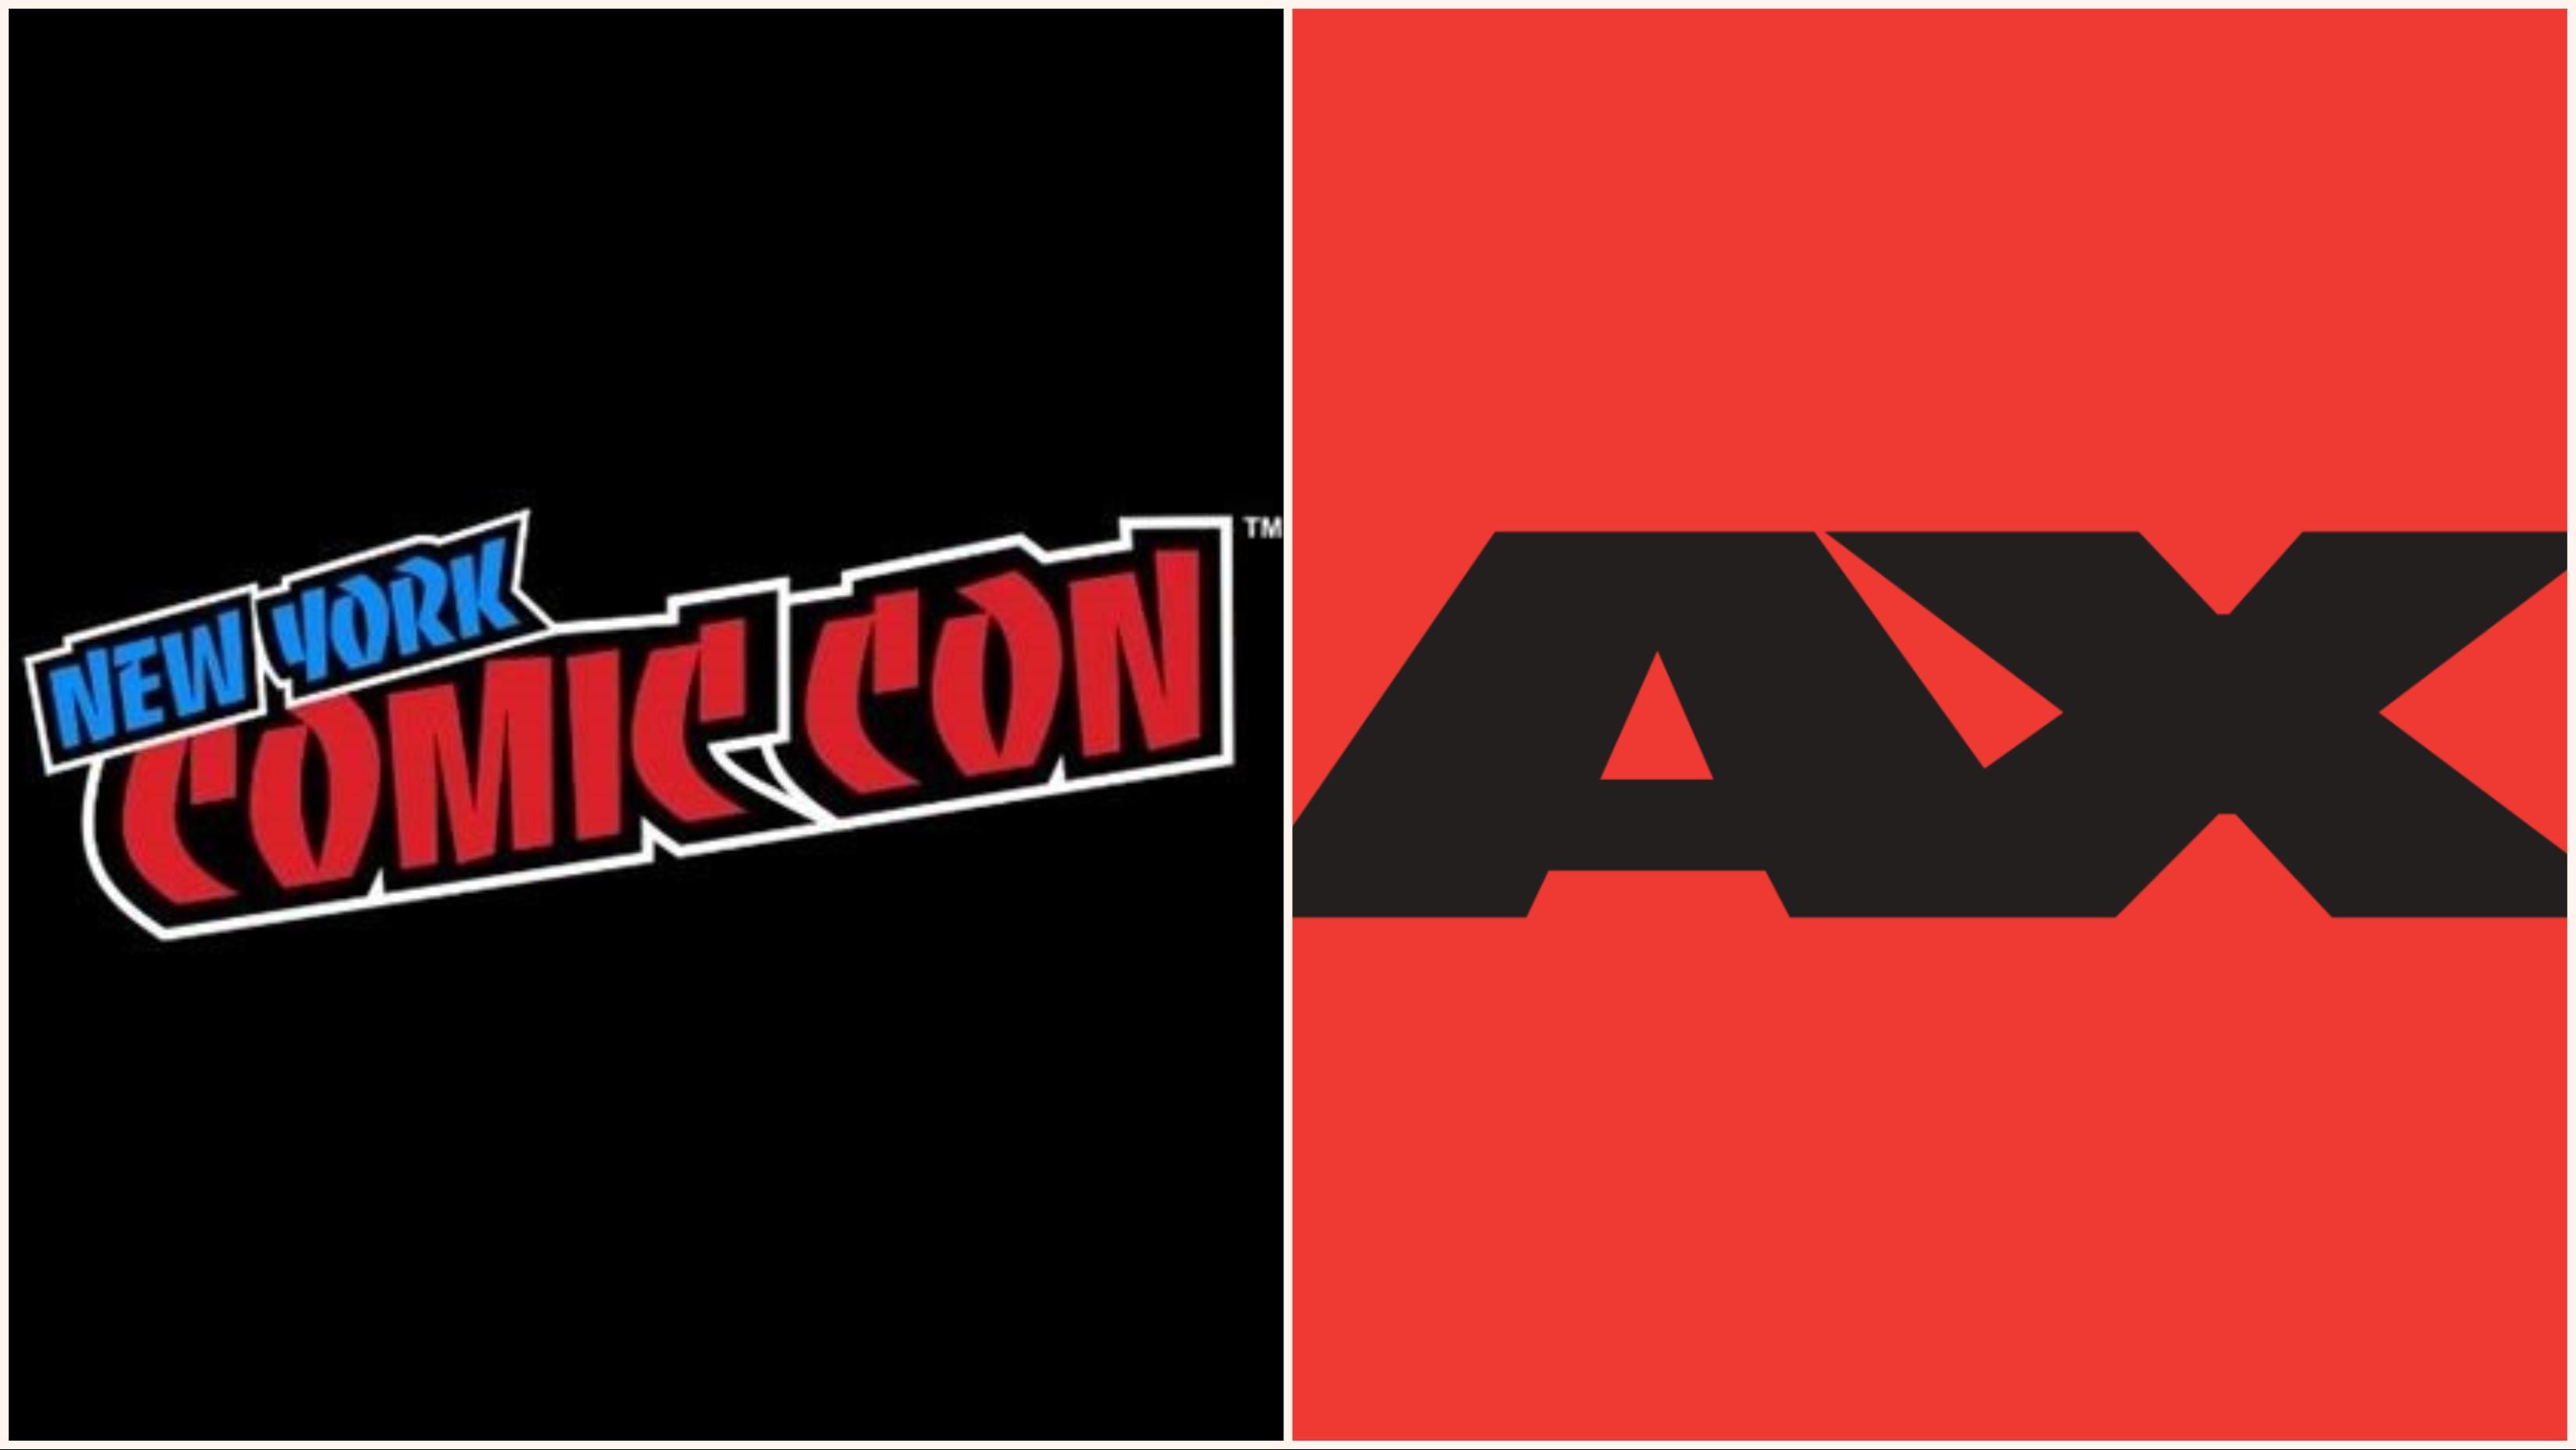 New York Comic Con and Anime Expo